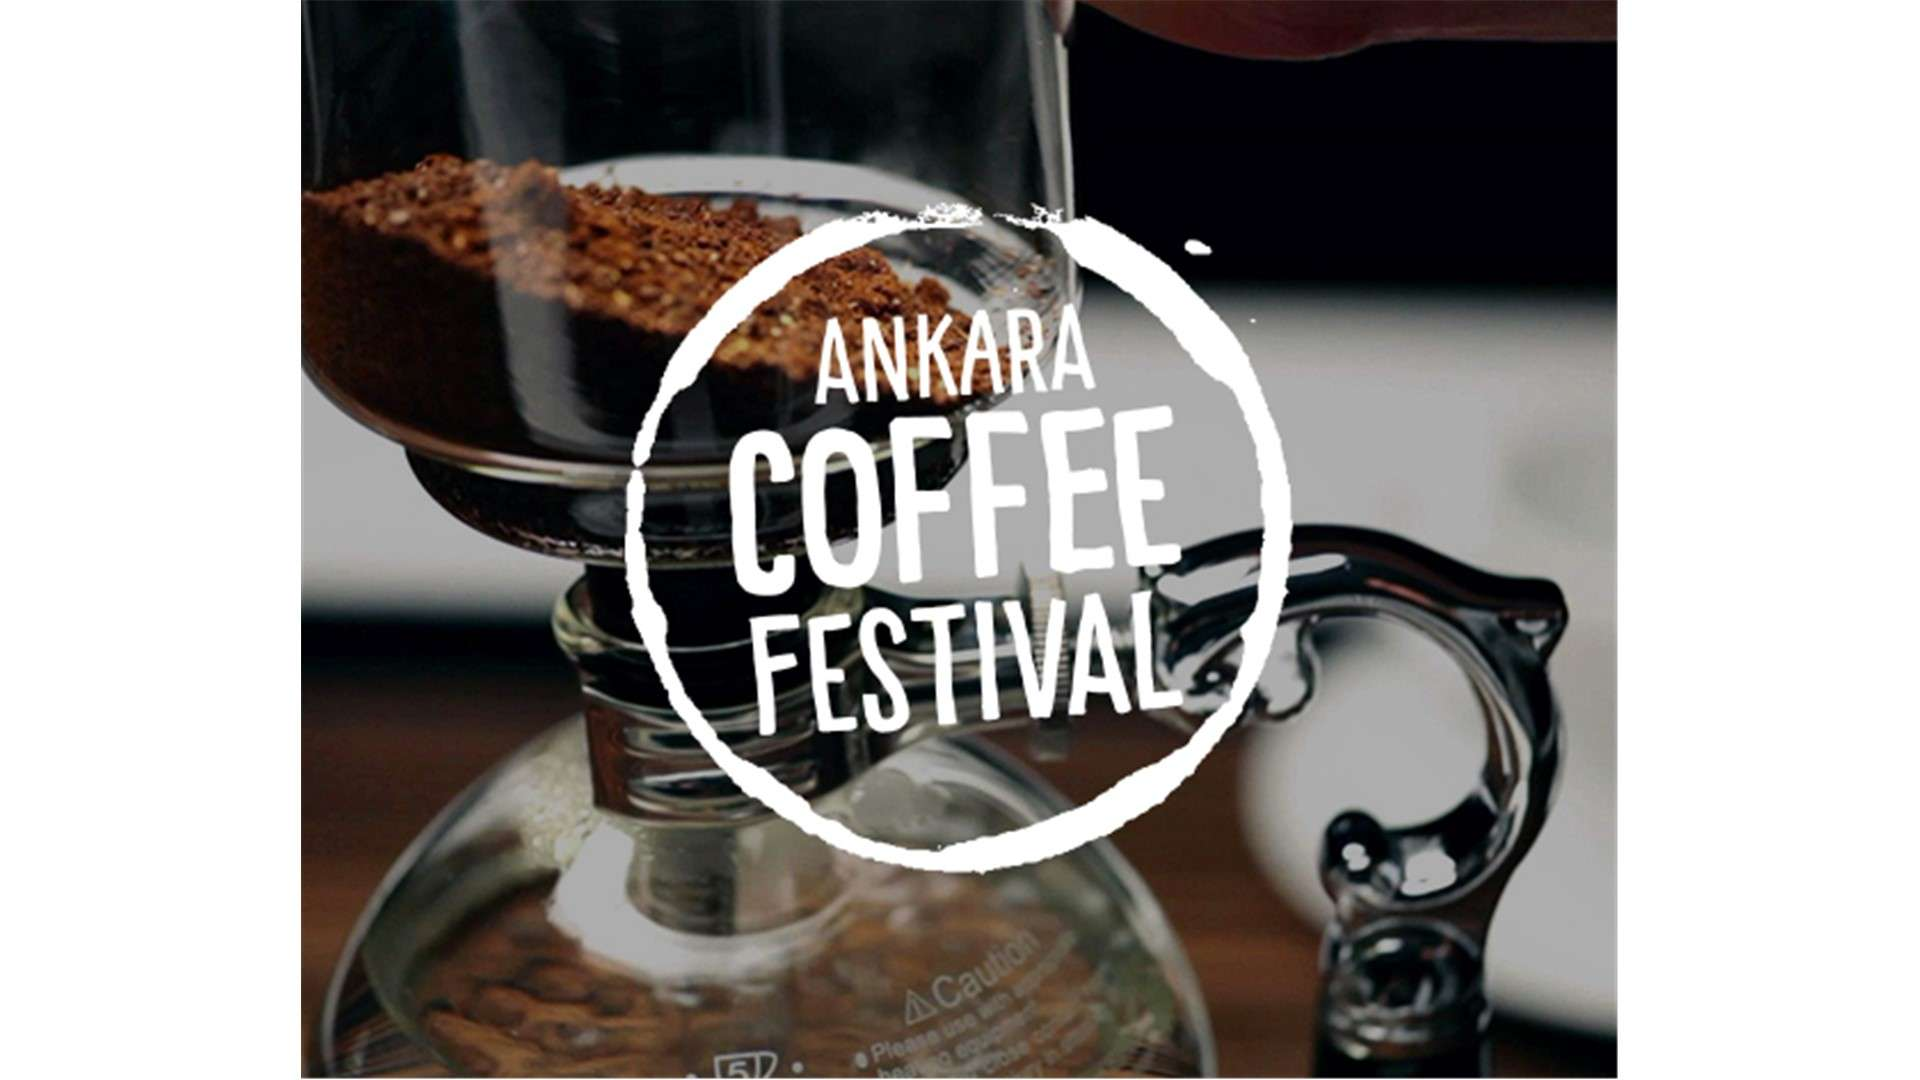 ankara-coffee-festival-889